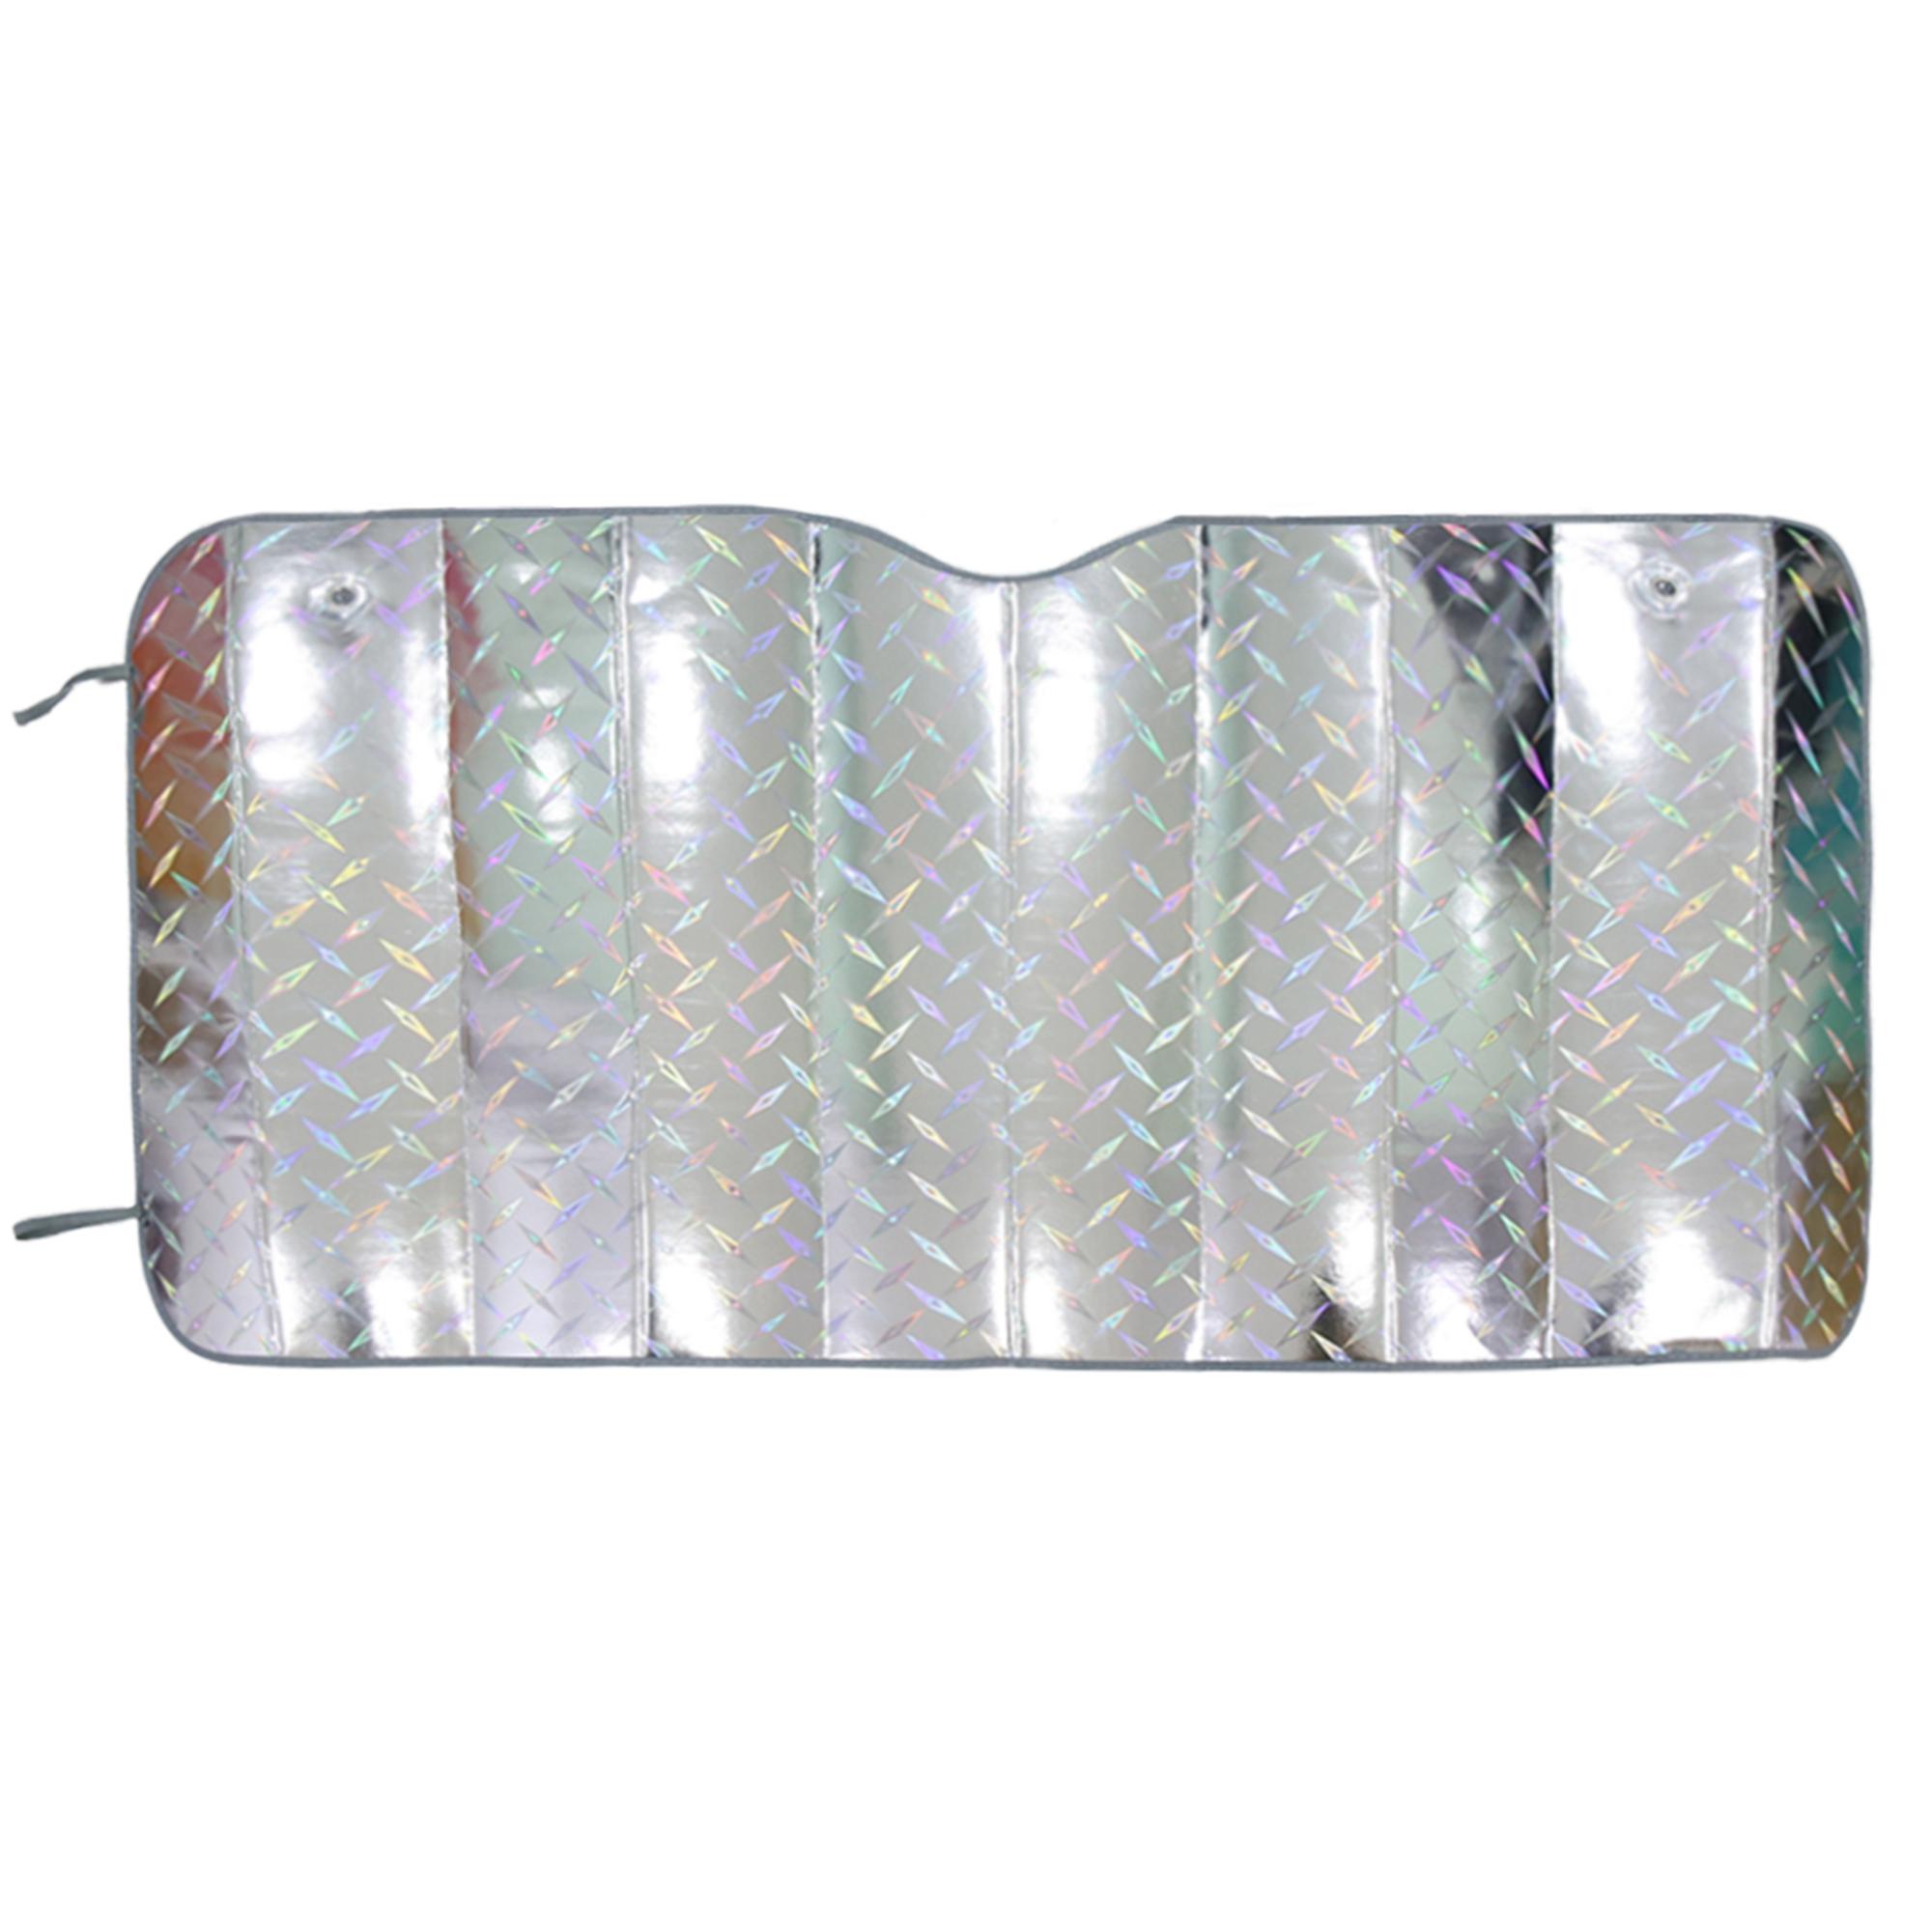 Foldable Automotive Car Windshield SunShade Visor for Heat Block UV Rays